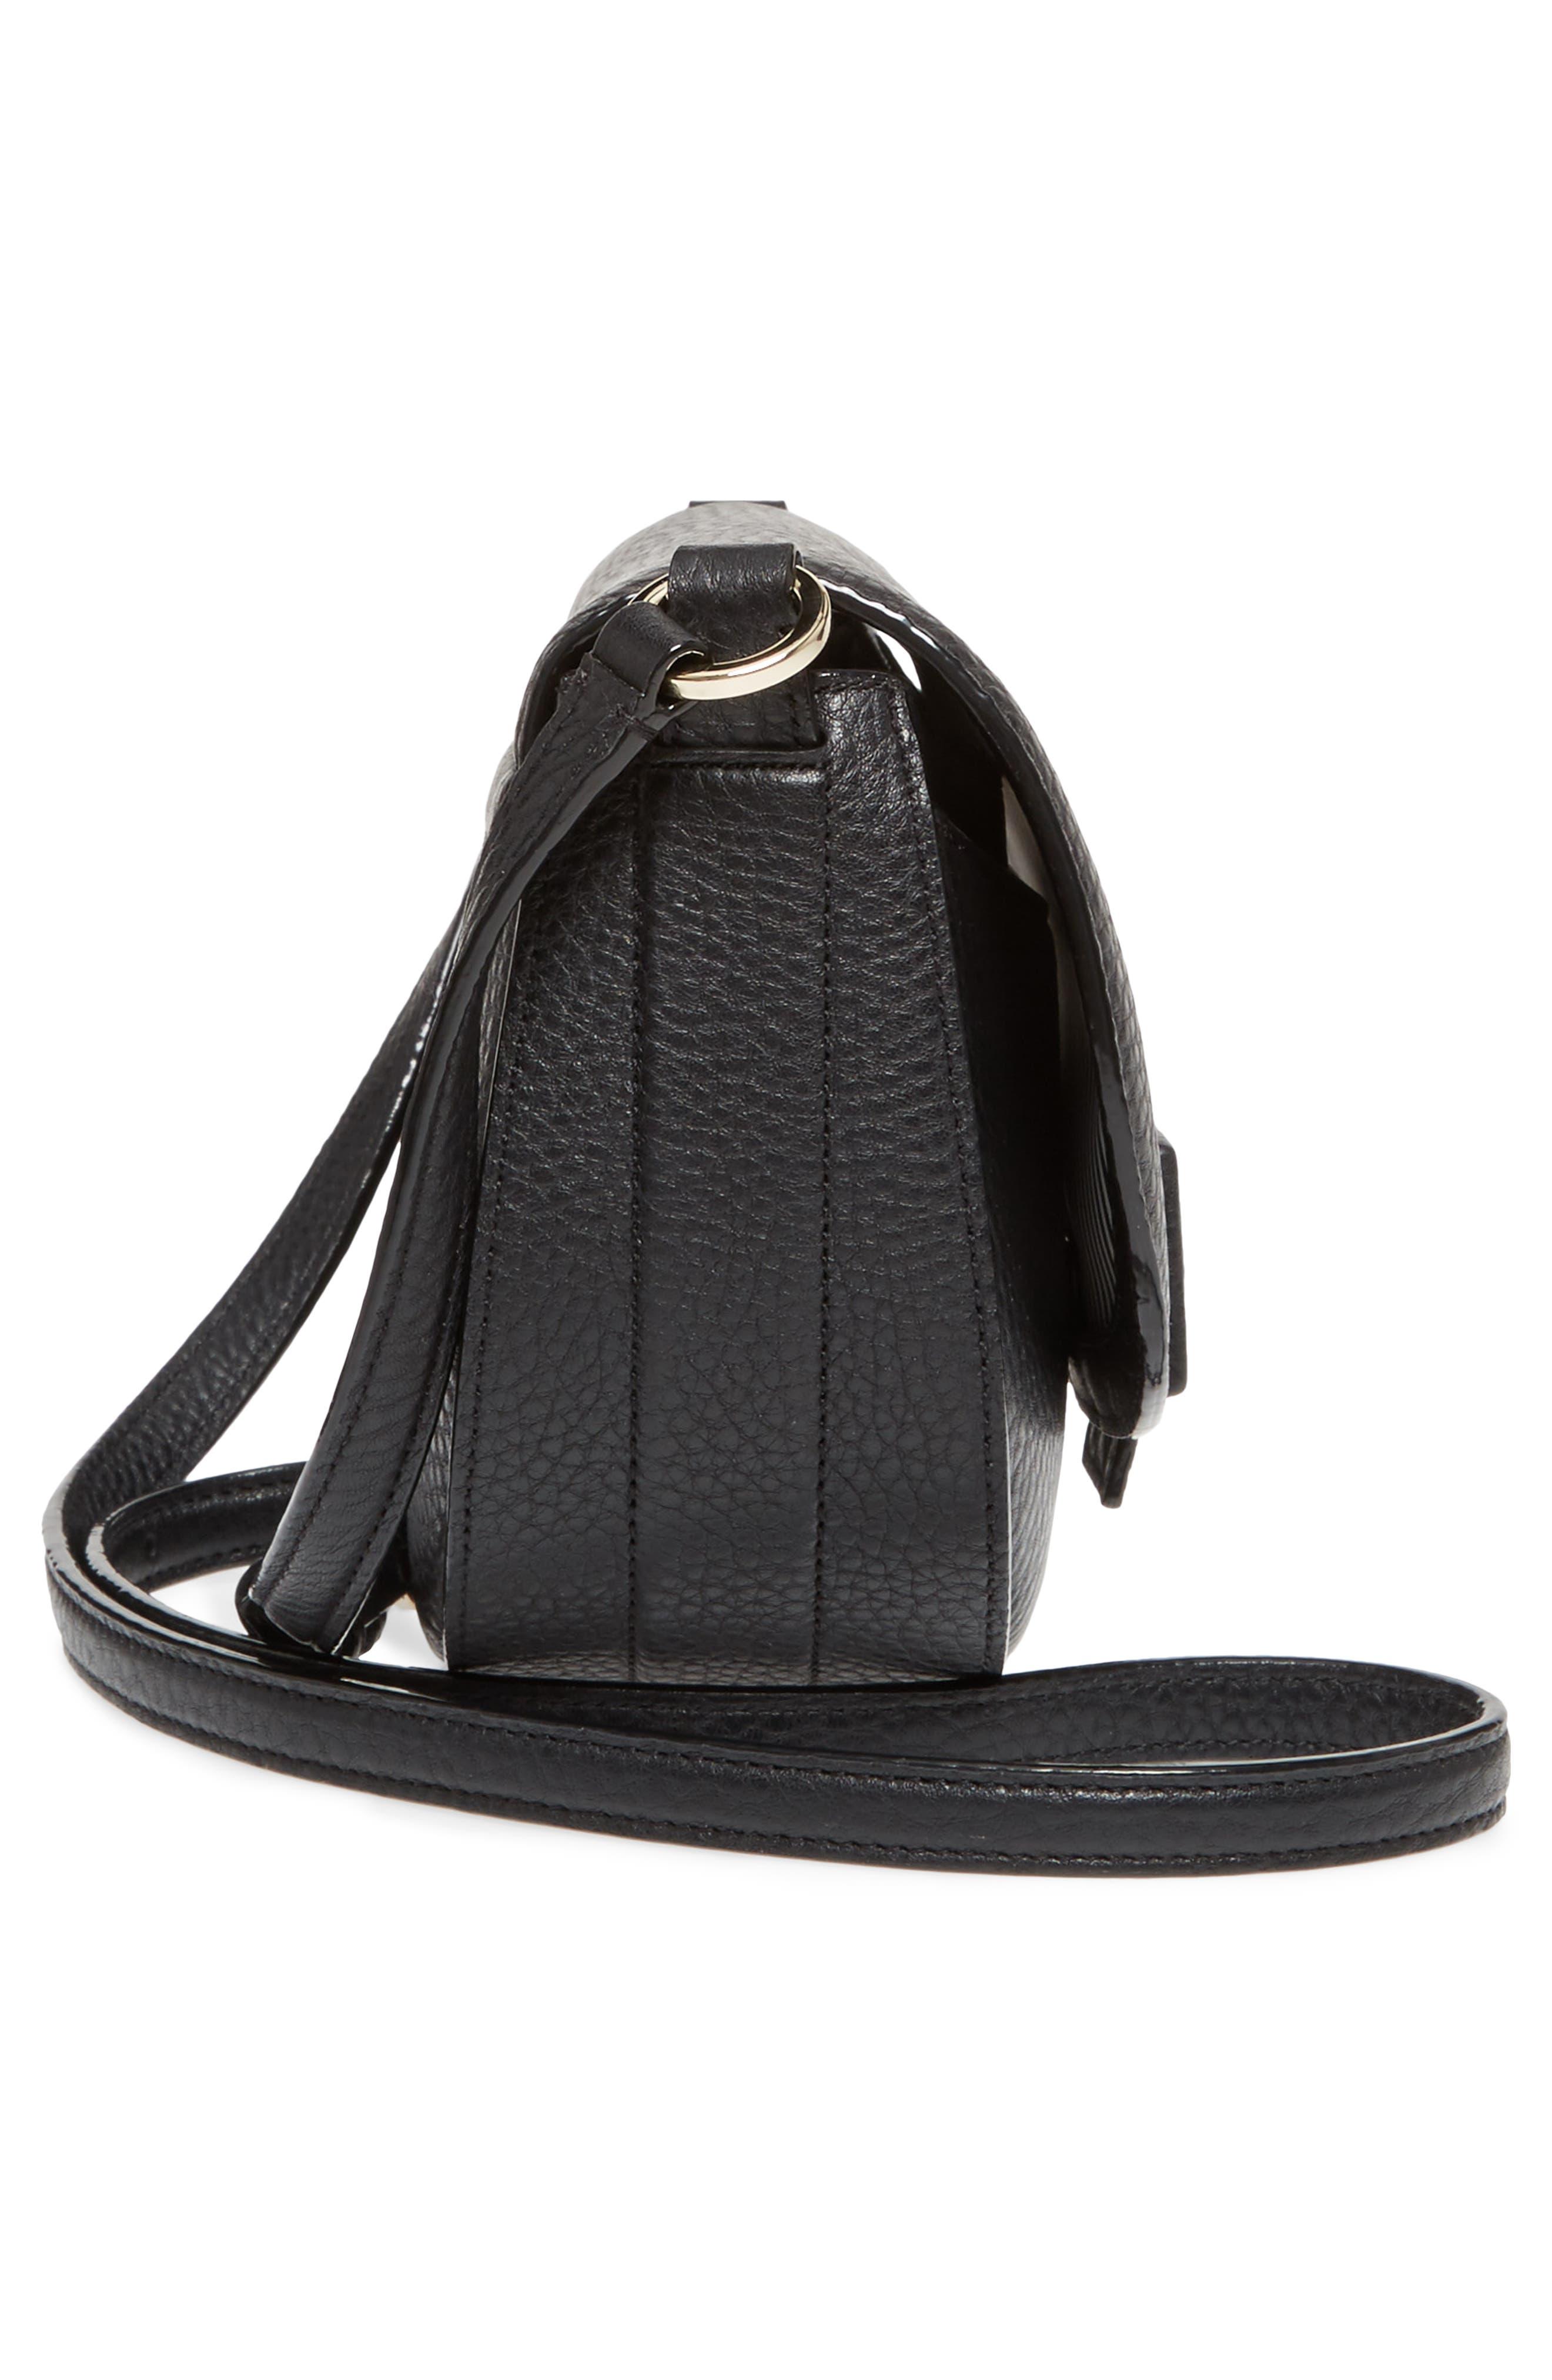 carlyle street - kallie leather saddle bag,                             Alternate thumbnail 13, color,